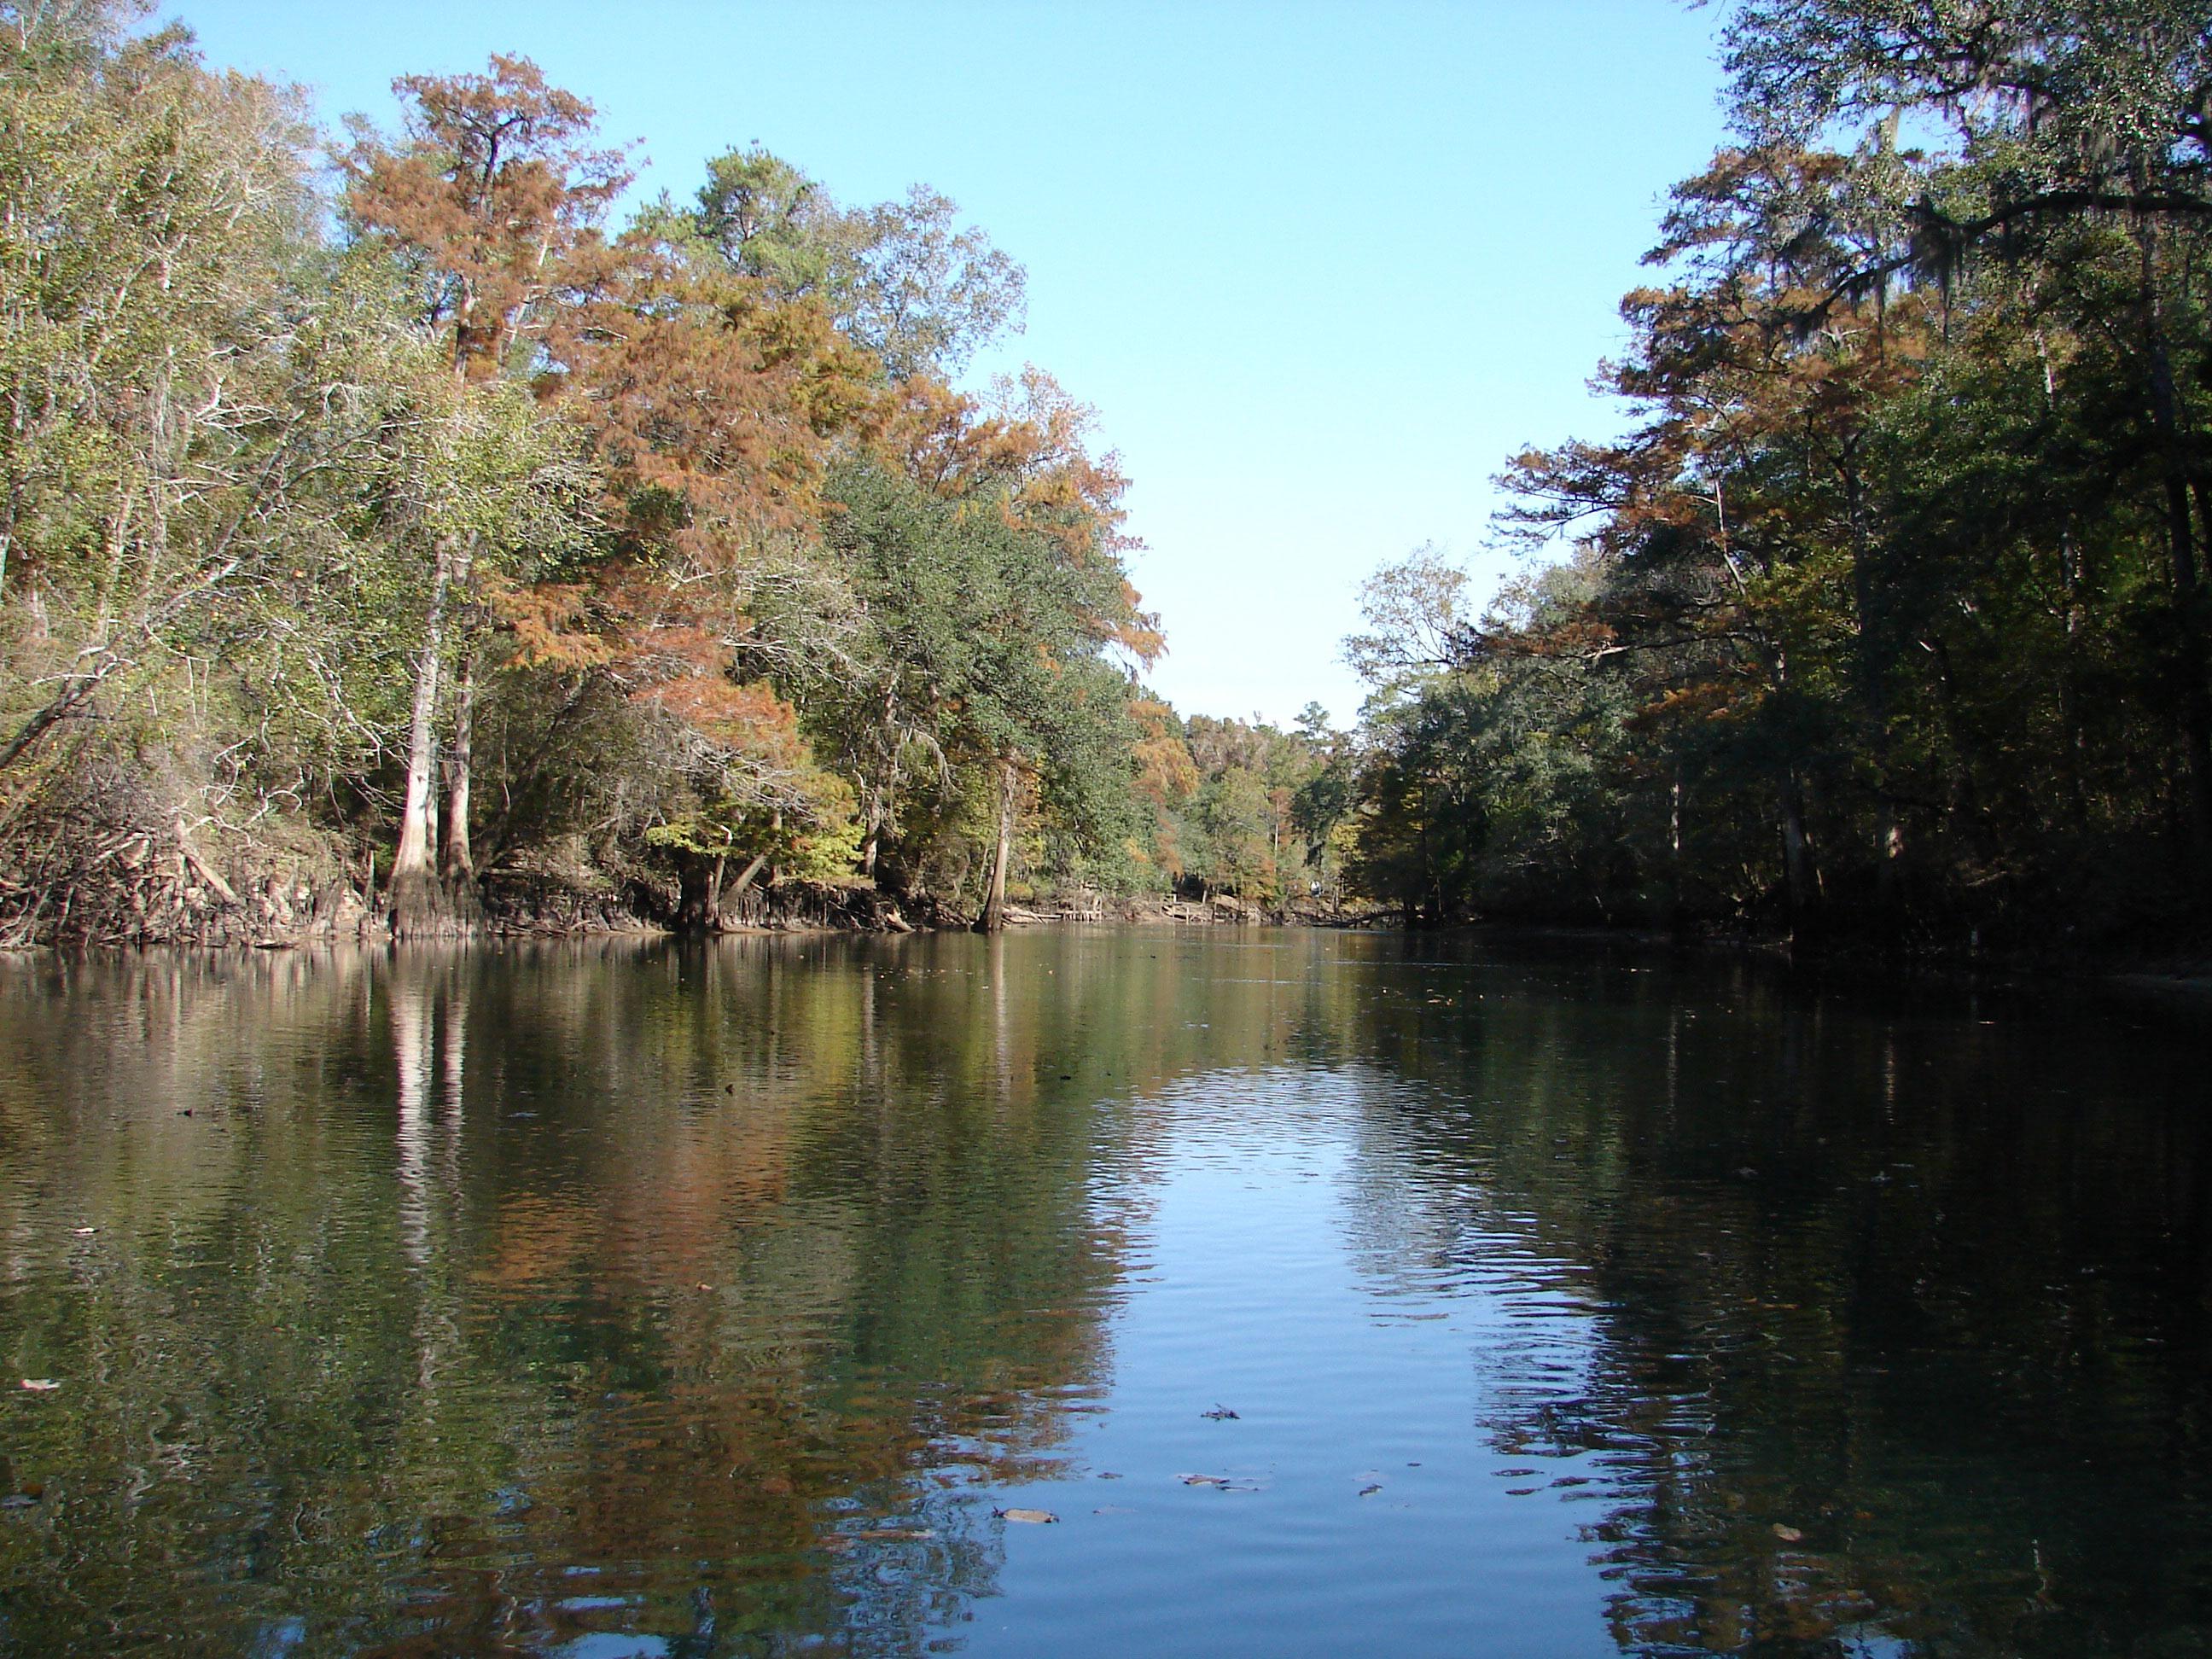 barges-pole-boats-once-traveled-stock-photos-florida-panhandle-chipola-river-linda-bateman